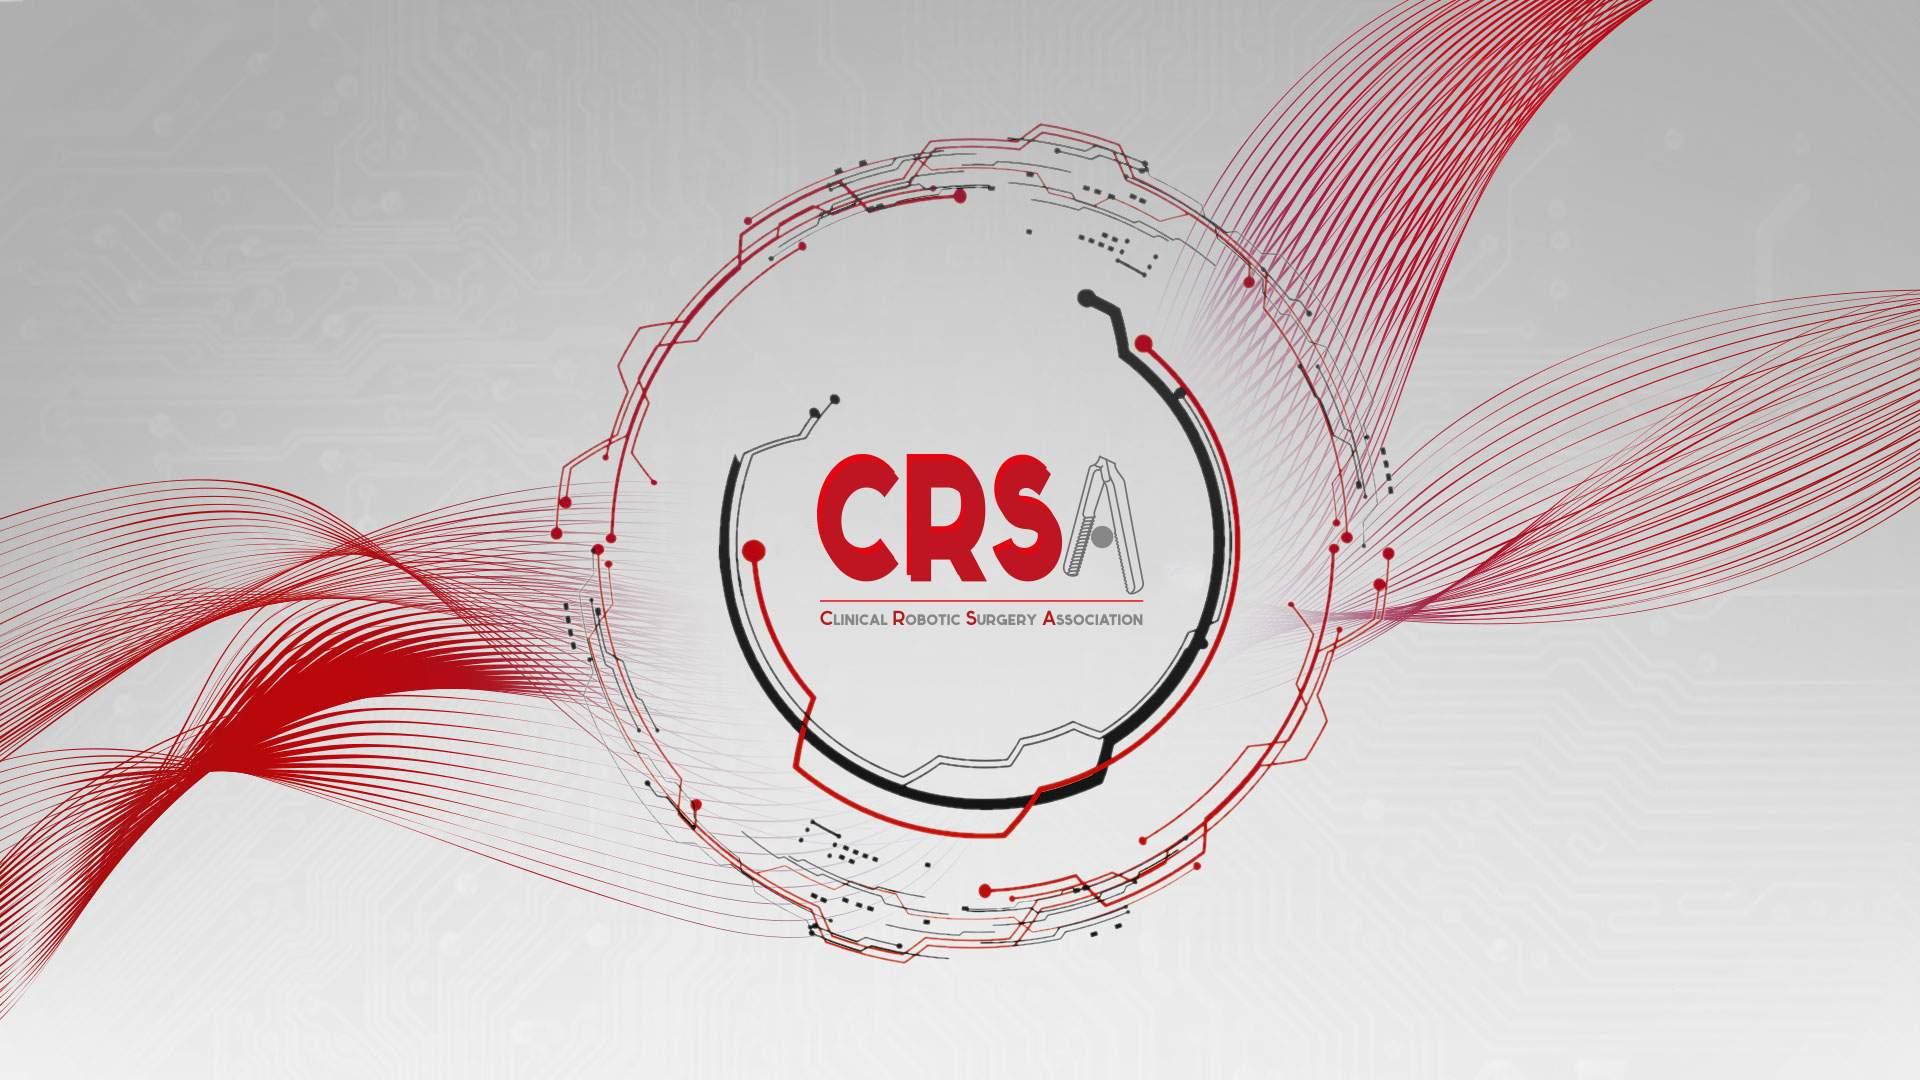 Clinical Robotic Surgery Association